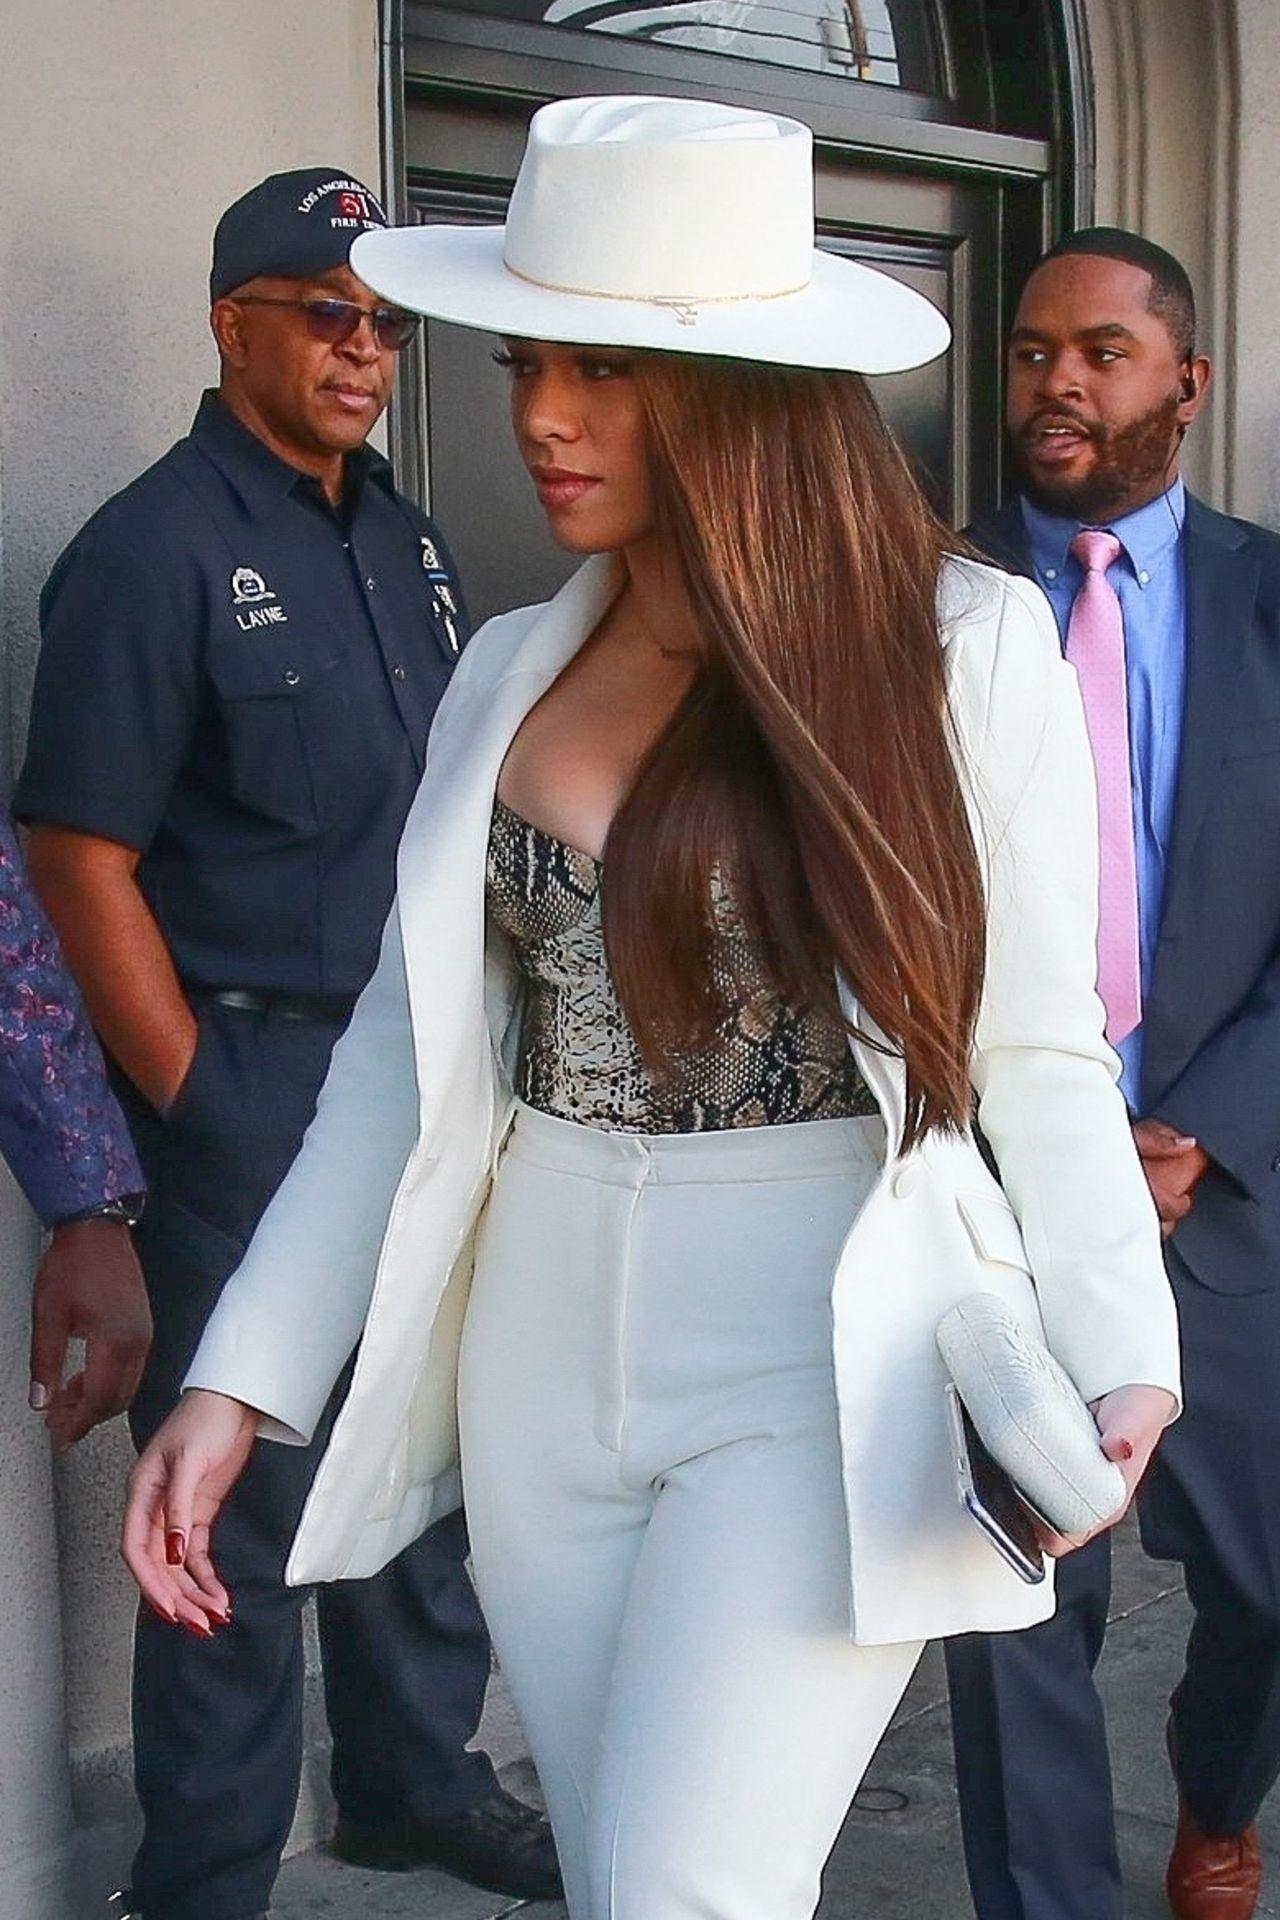 Dinah Jane Departs The Women In Harmony Pre Grammy Luncheon 0001